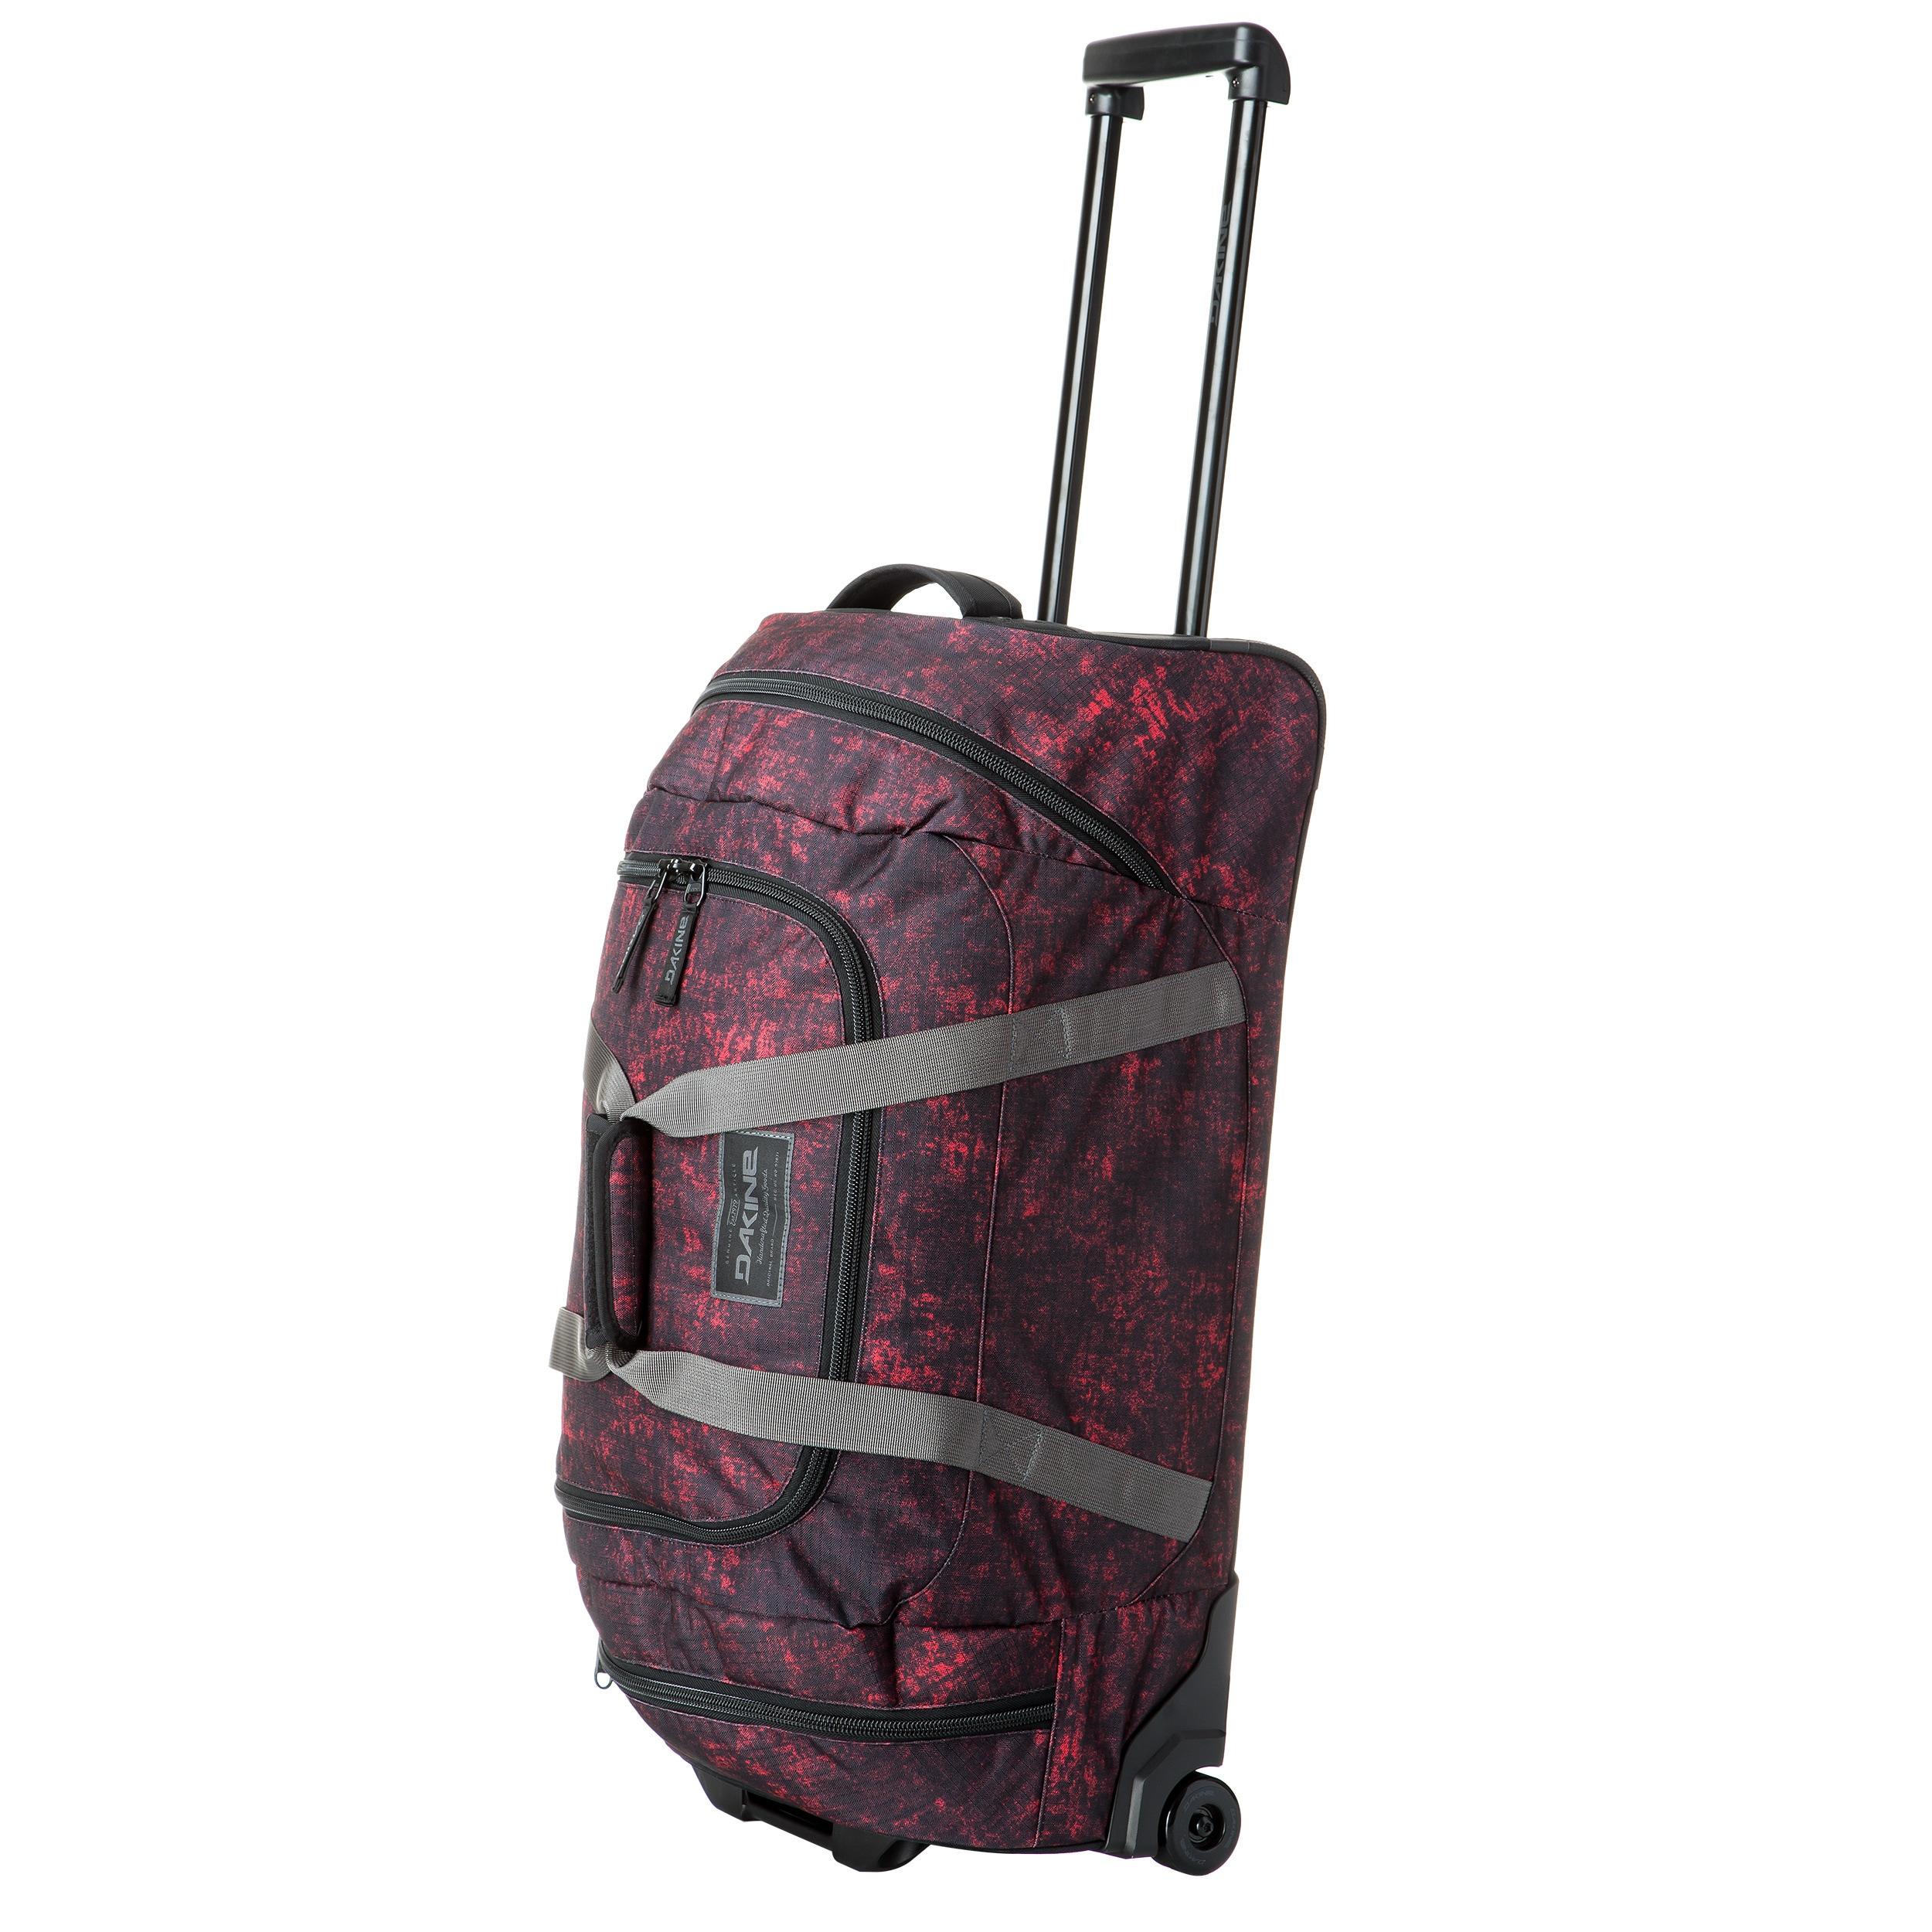 b1a05650aa86 Shop Dakine Lava 28-inch 58L Rolling Duffel Bag - Free Shipping Today -  Overstock - 11141135